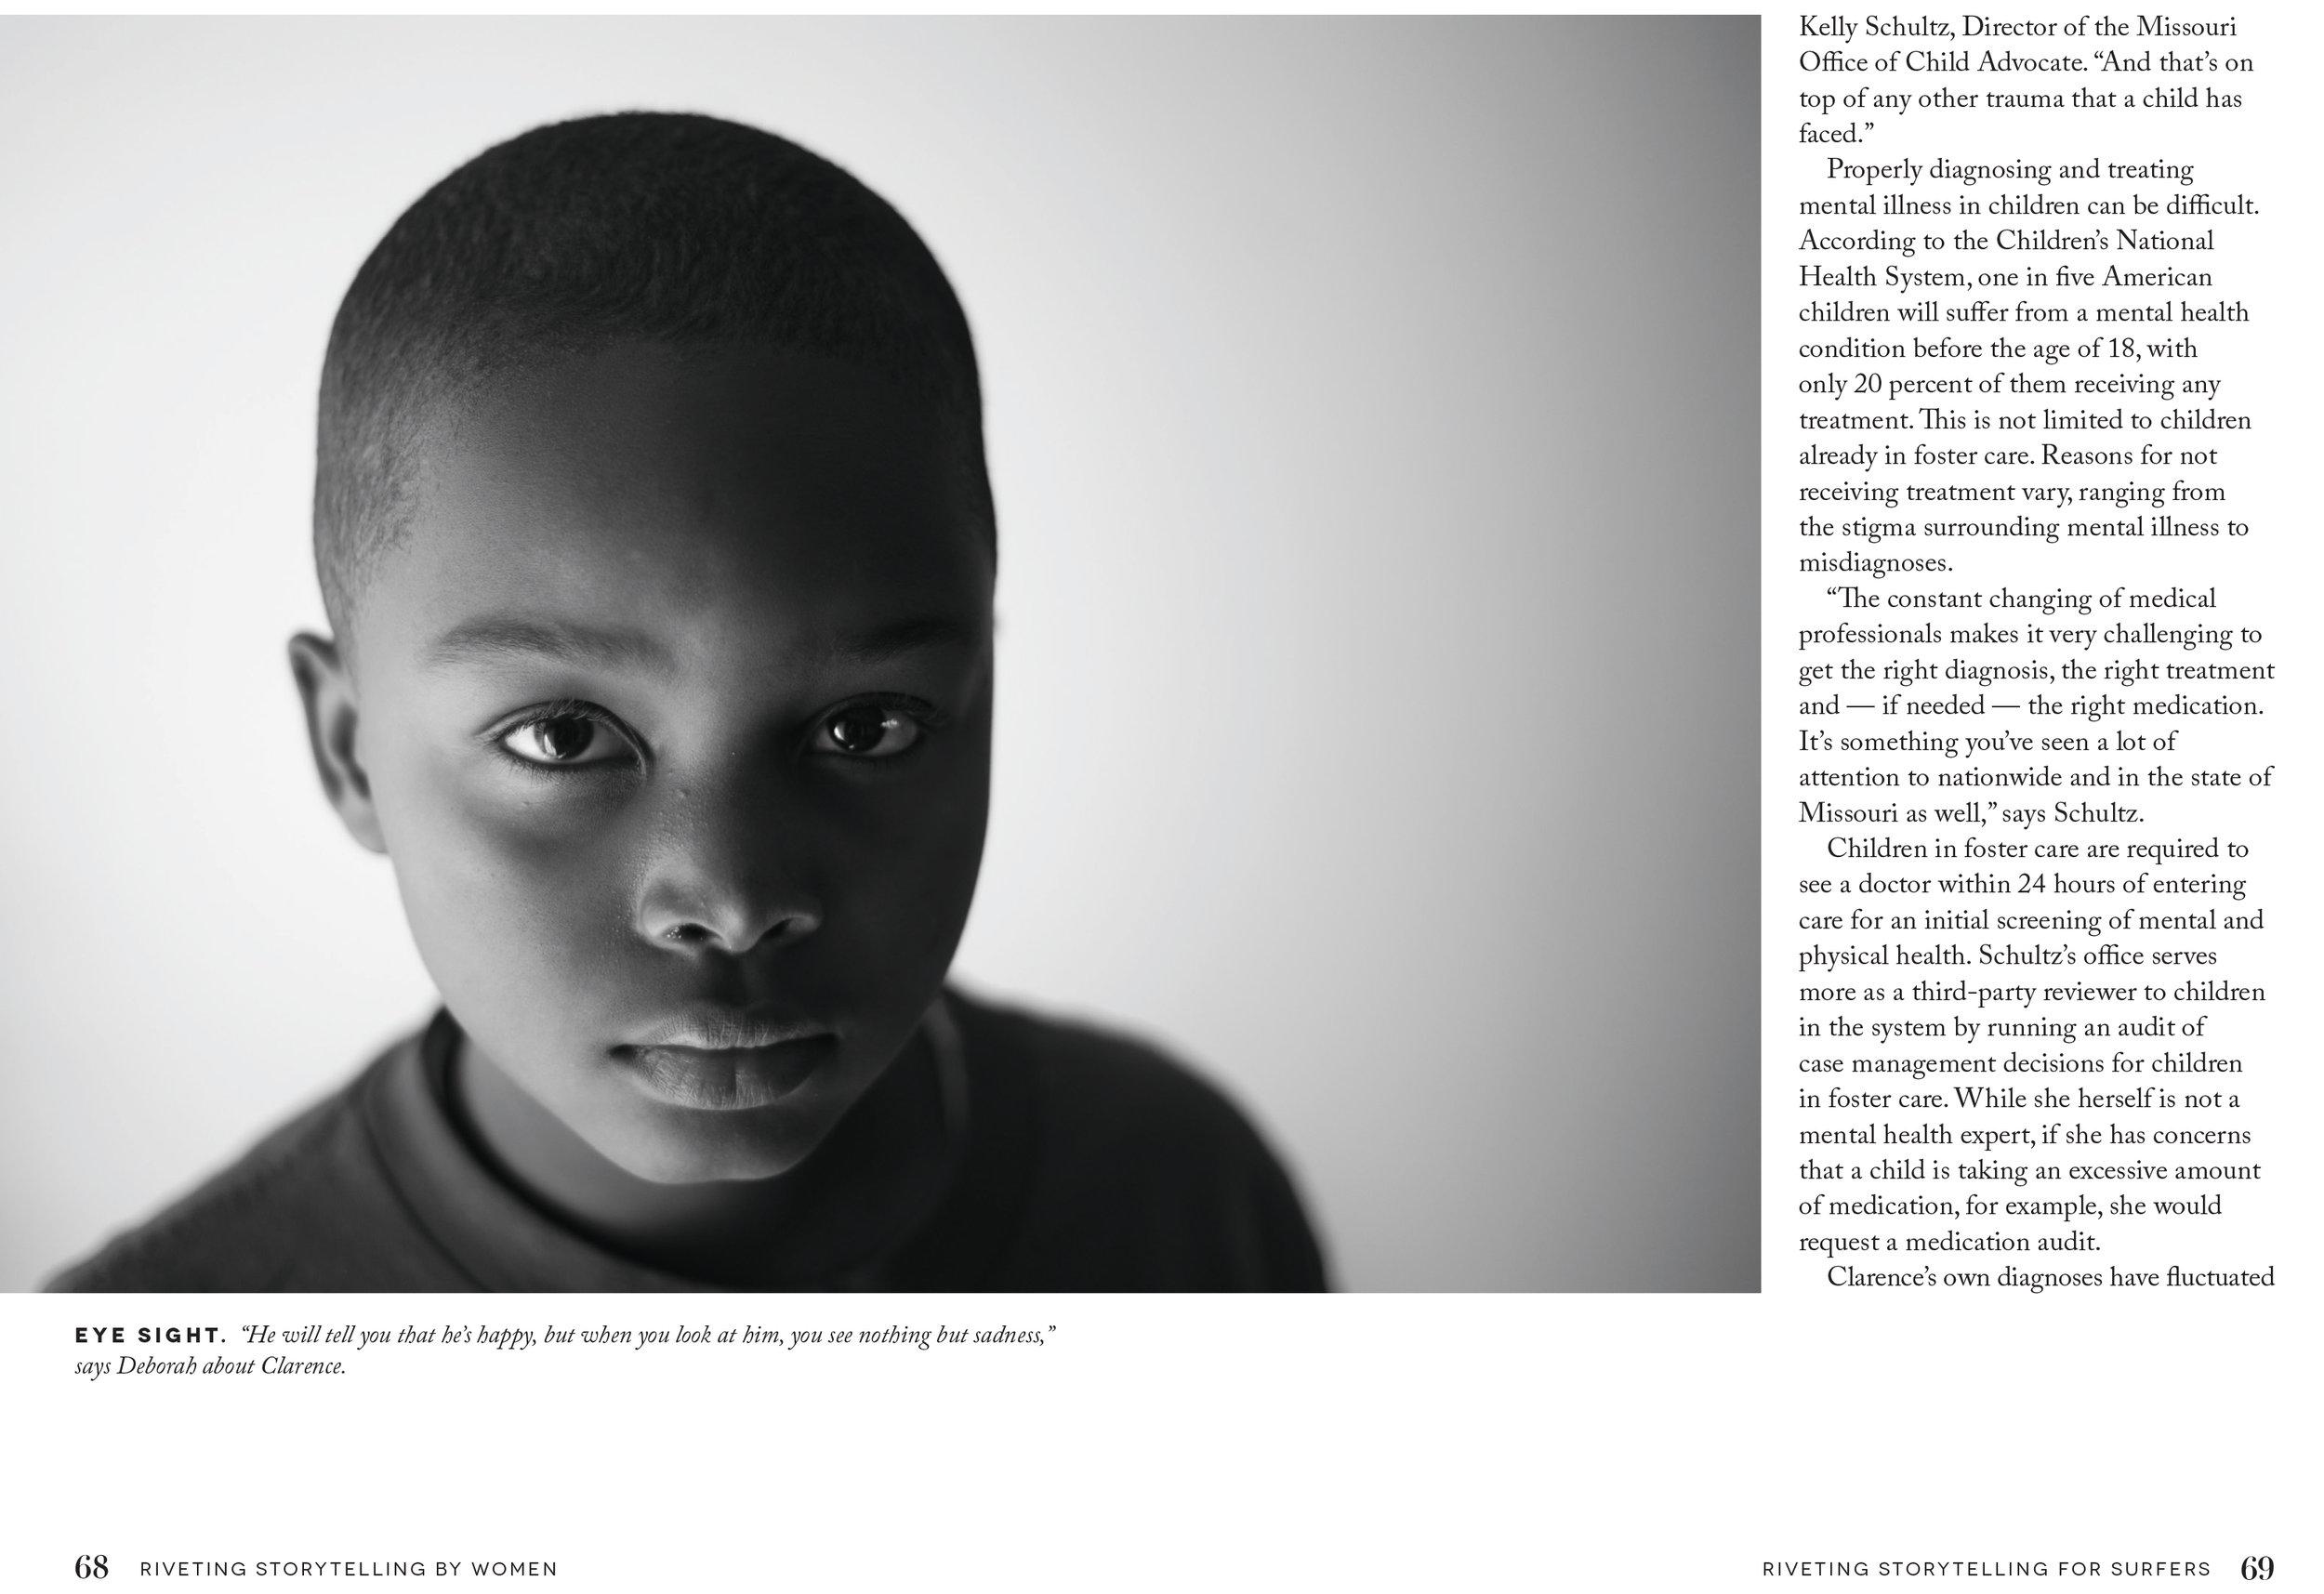 TheRiveter_Issue03_PhotoEssay-3.jpg